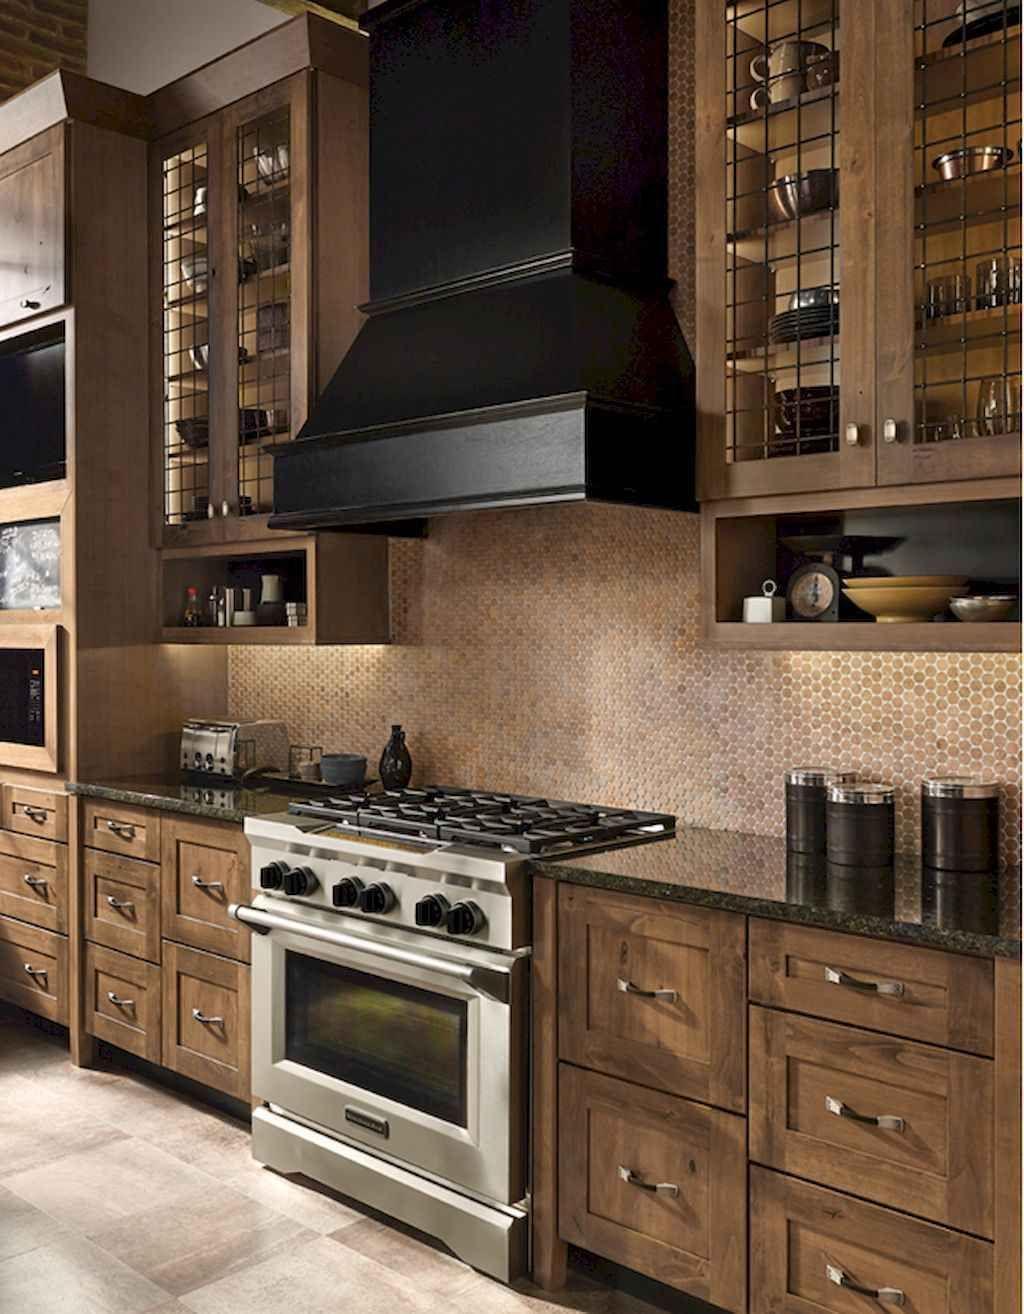 90 Rustic Kitchen Cabinets Farmhouse Style Ideas (47 #darkkitchencabinets